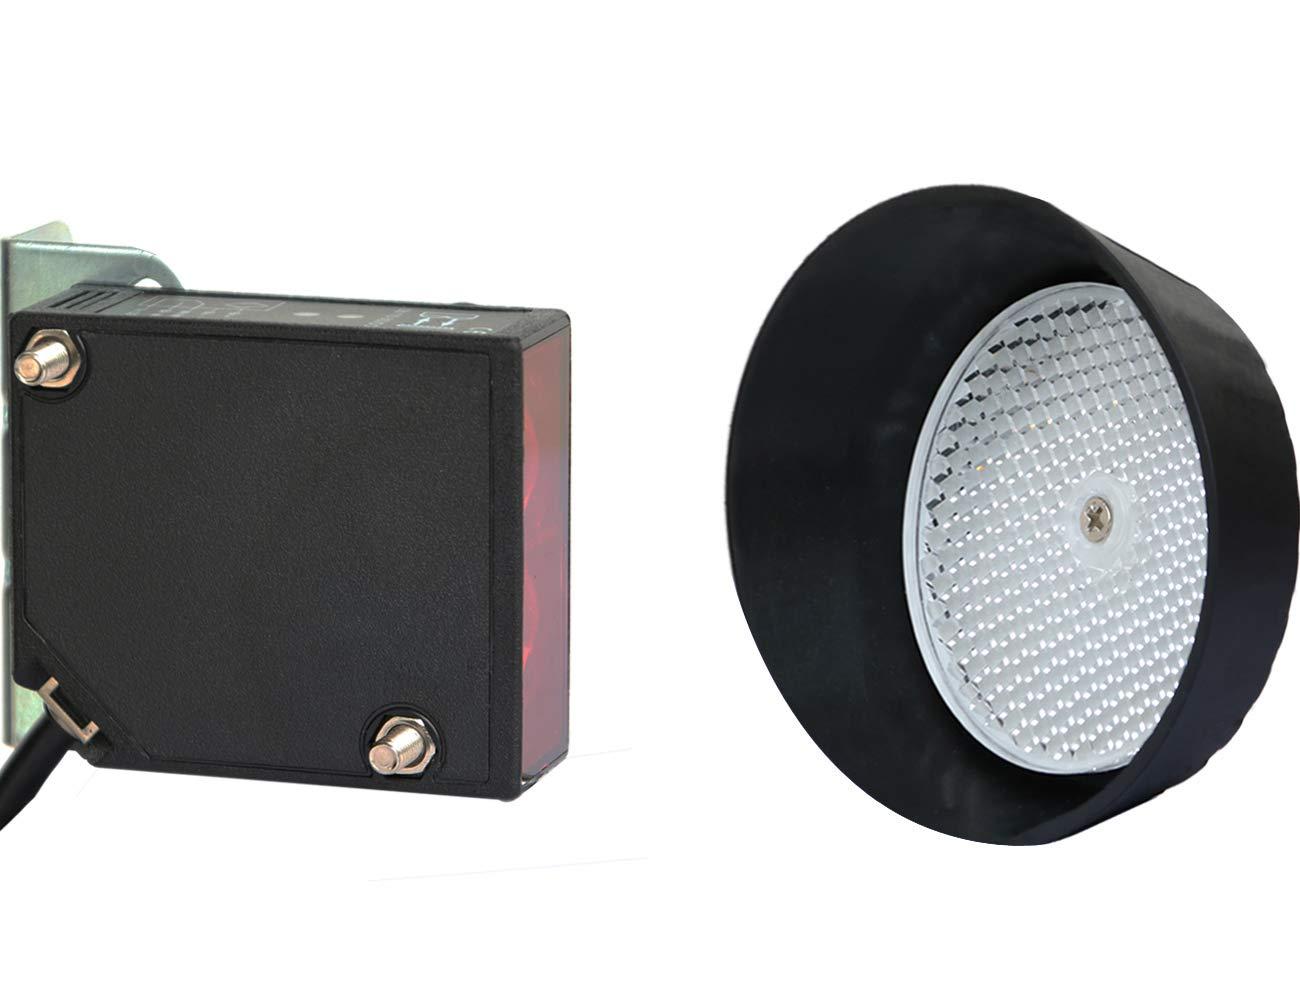 Photoelectric Beam Sensor for Gate Garage Door Opener Safety Reversing Reflective Infrared Sensor Reflector Photo Eye Wall Mounted